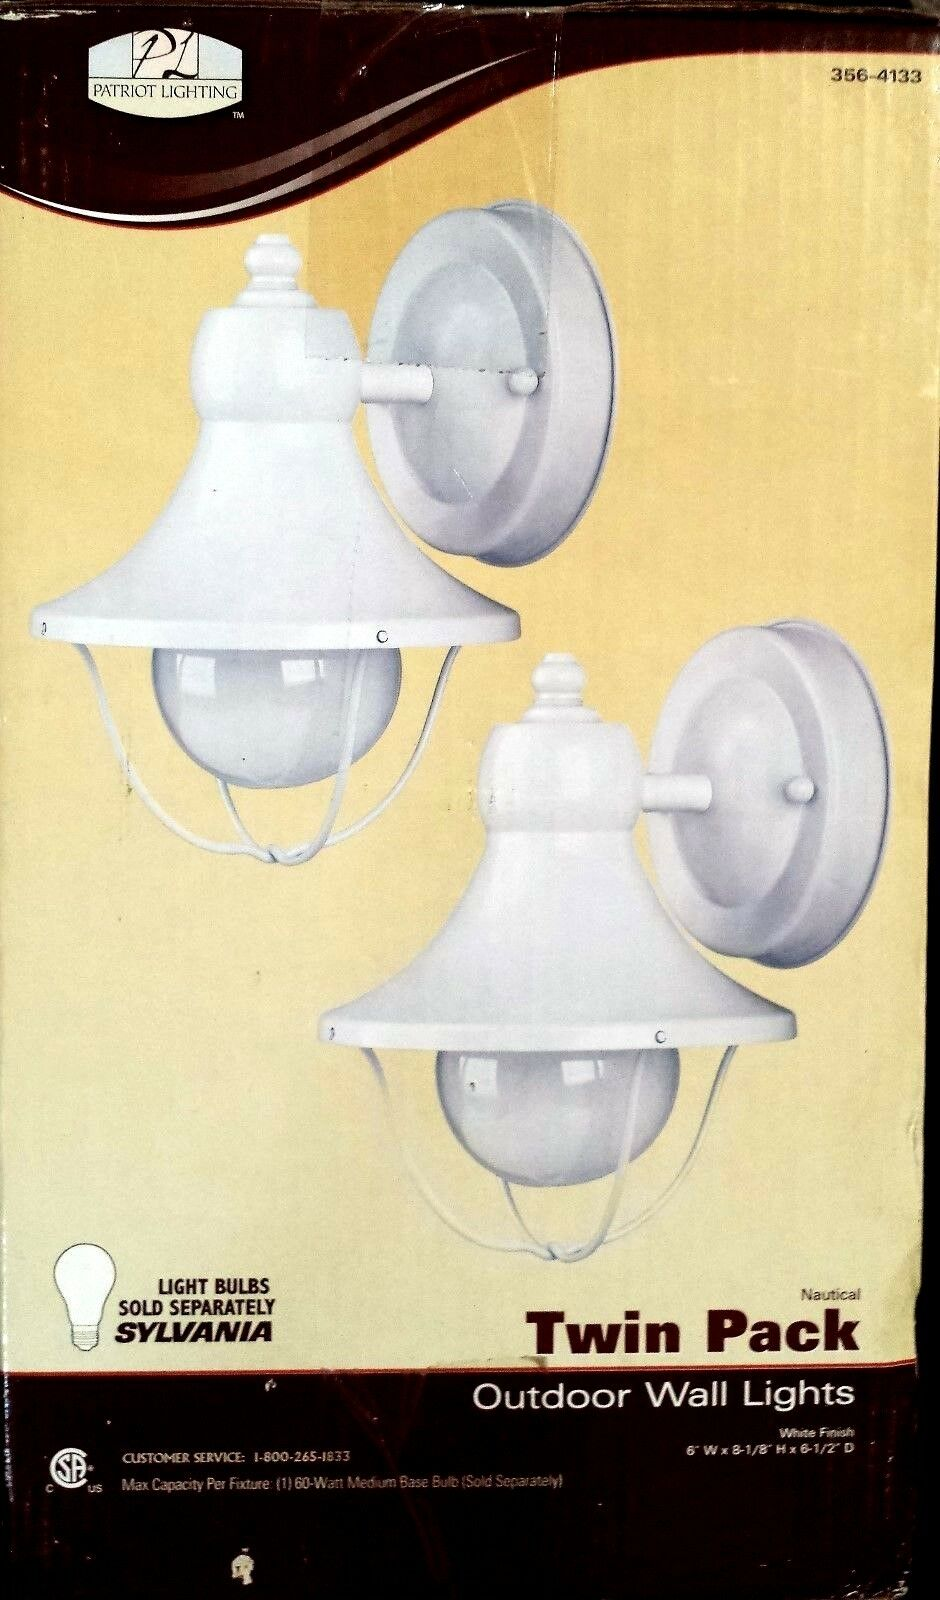 2 Nautical Outdoor Wall Lights Patriot Lighting - White Fini